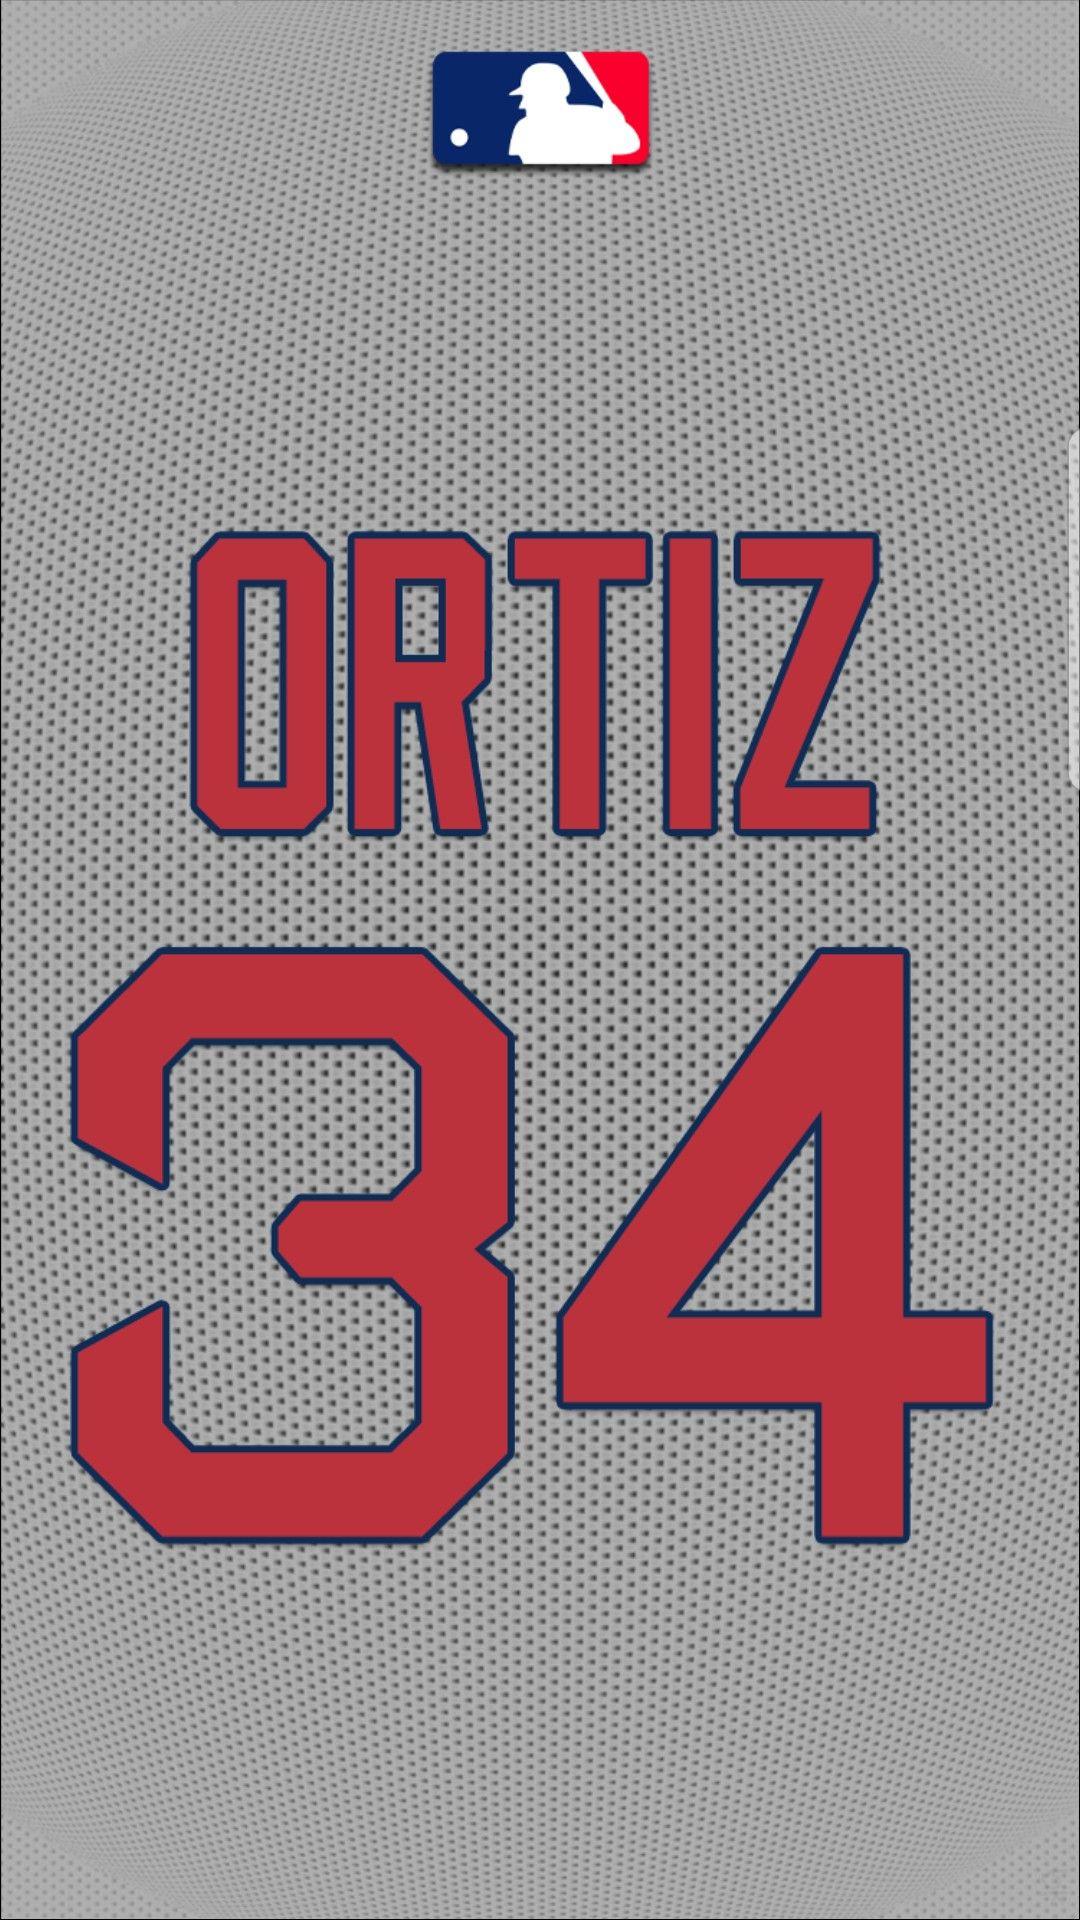 Pin By Archie Douglas On Pittsburgh Pirates Red Sox Iphone Wallpaper Mlb Baseball Teams Phillies Baseball